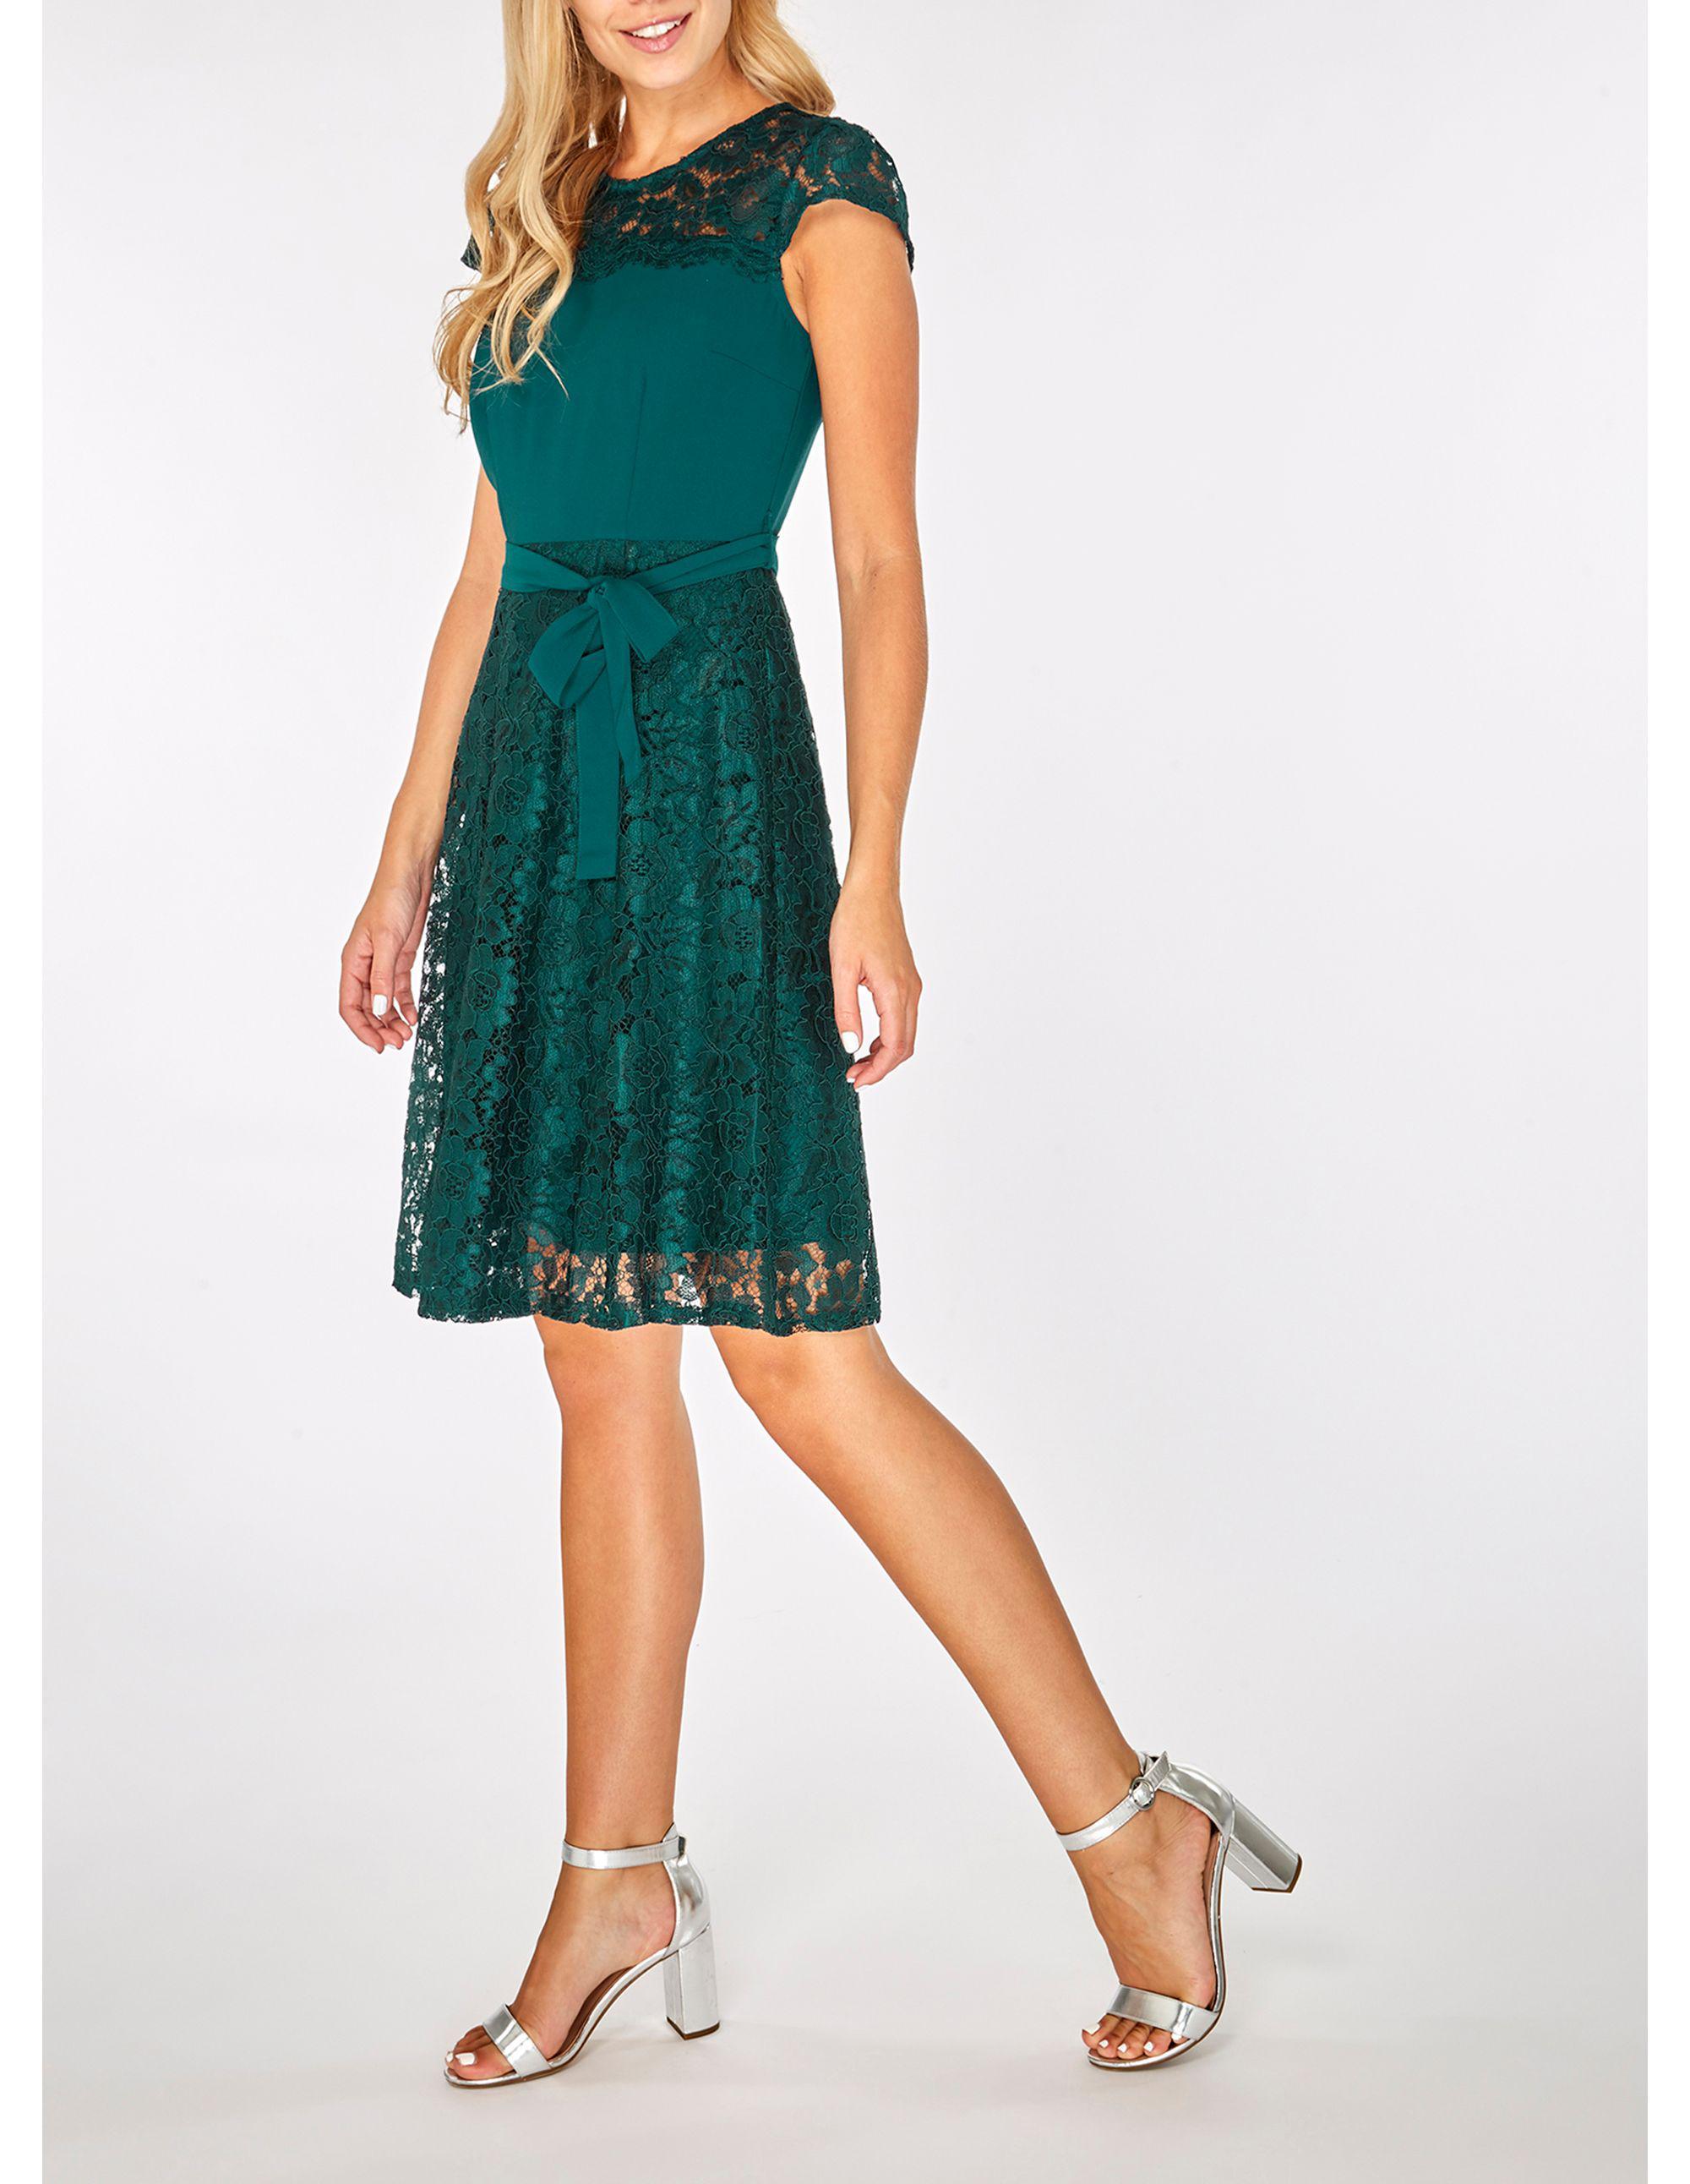 Billie Blossom Green Short Sleeve Lace Skater Dress